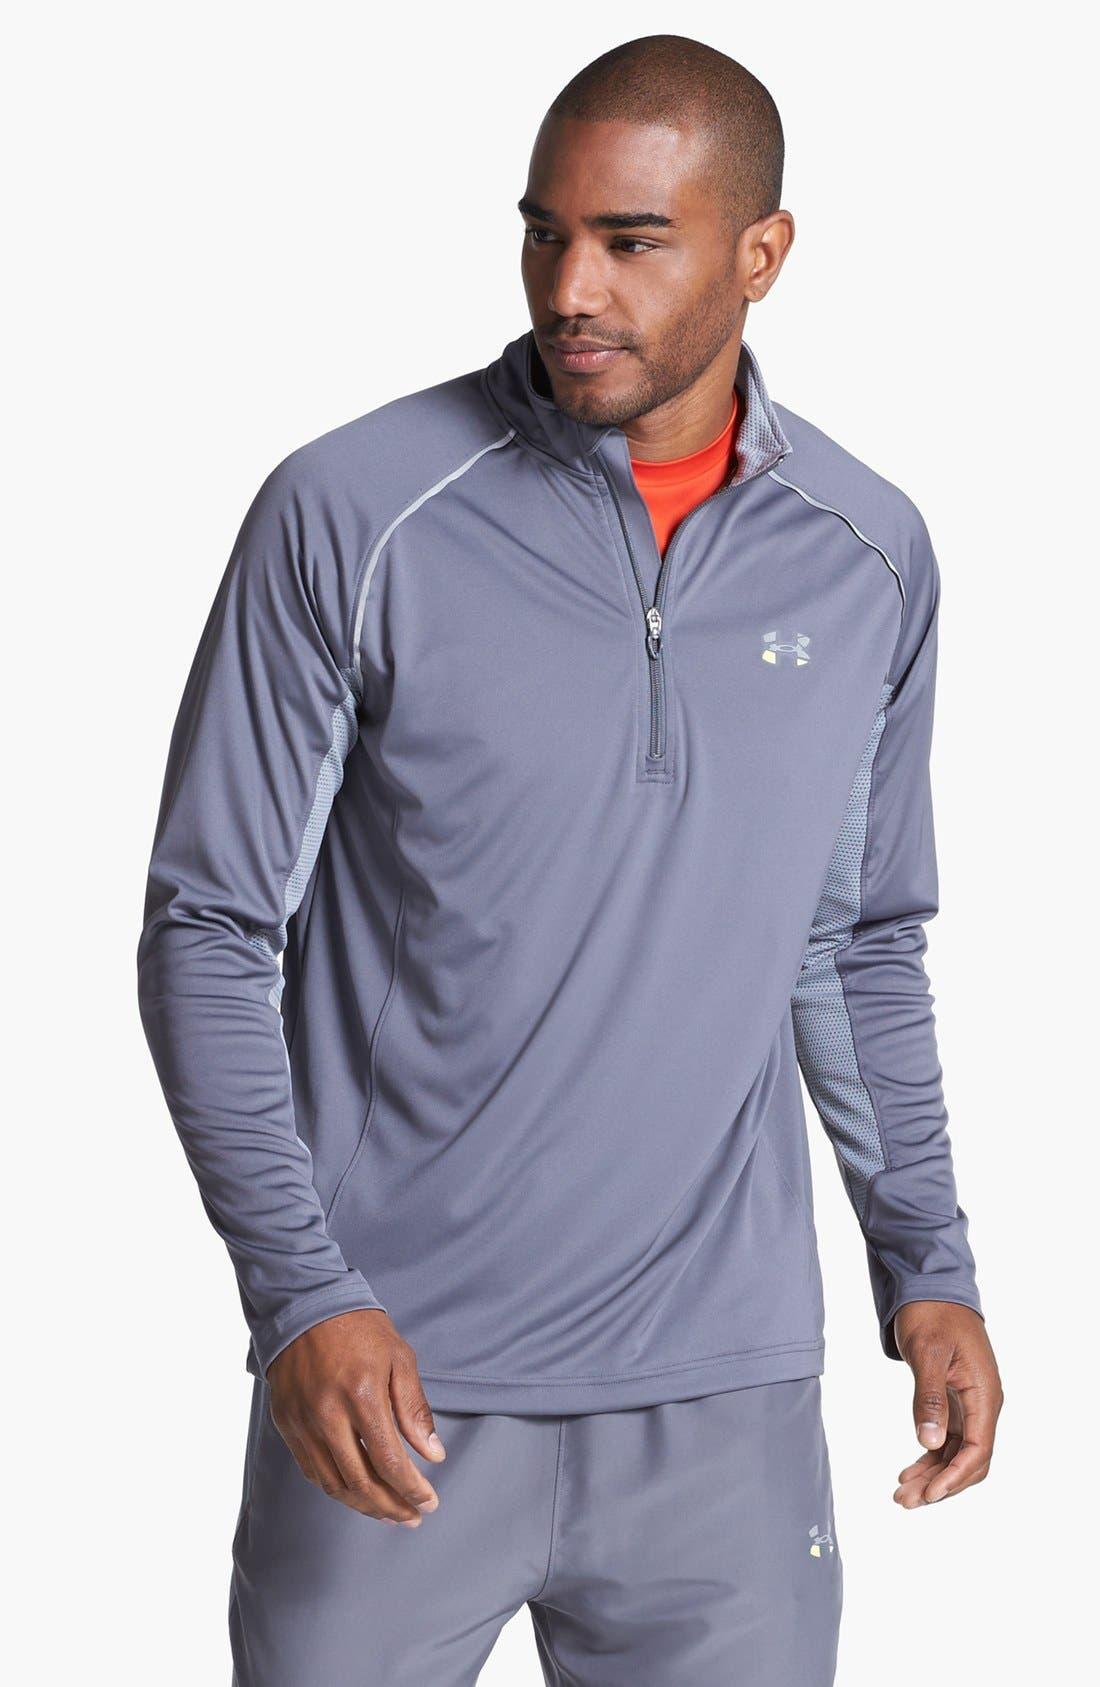 Main Image - Under Armour Quarter Zip Shirt